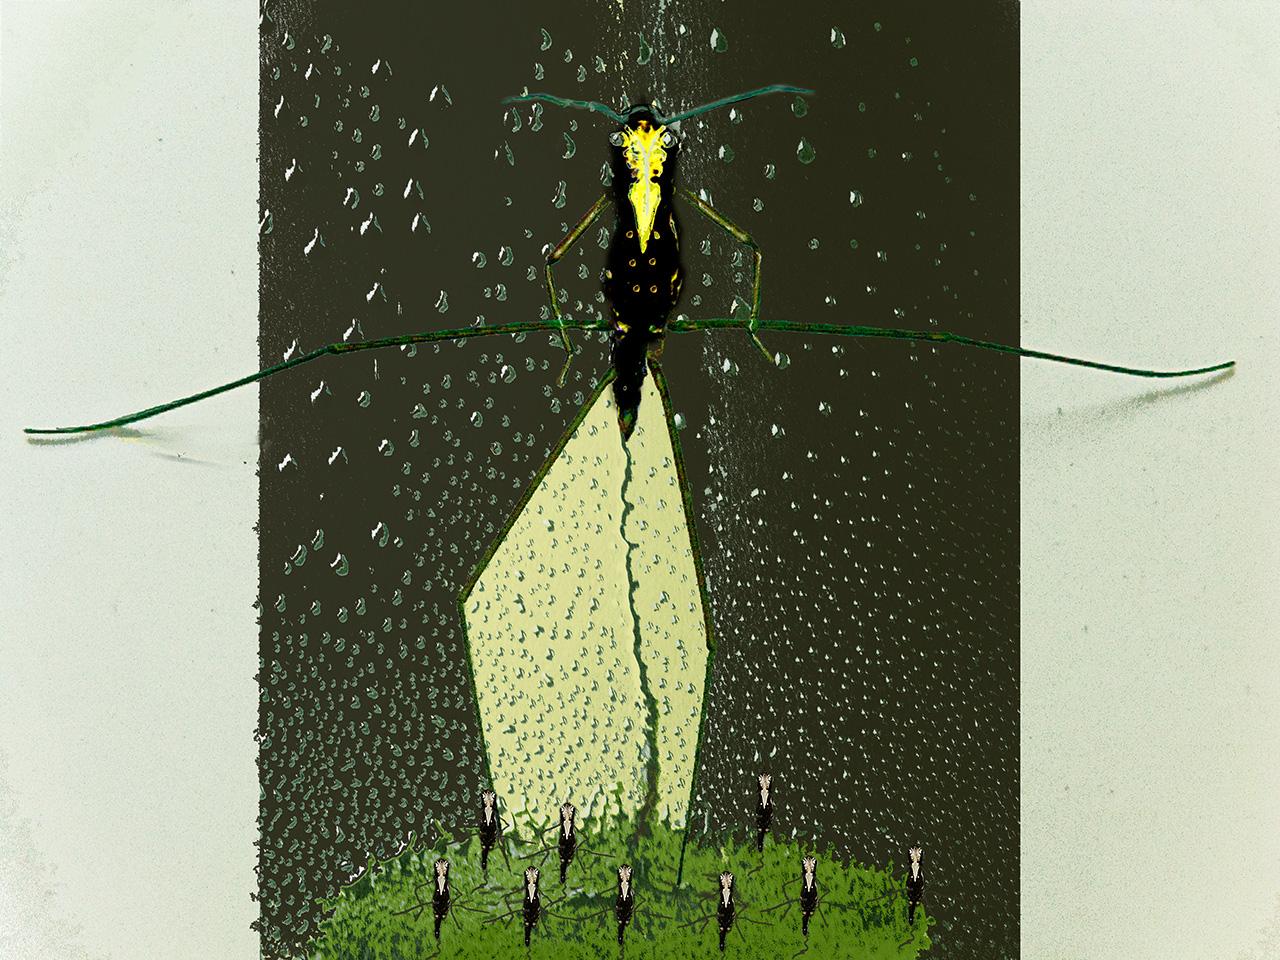 Schule der Wasseräufer, 2011, Inkjet Print